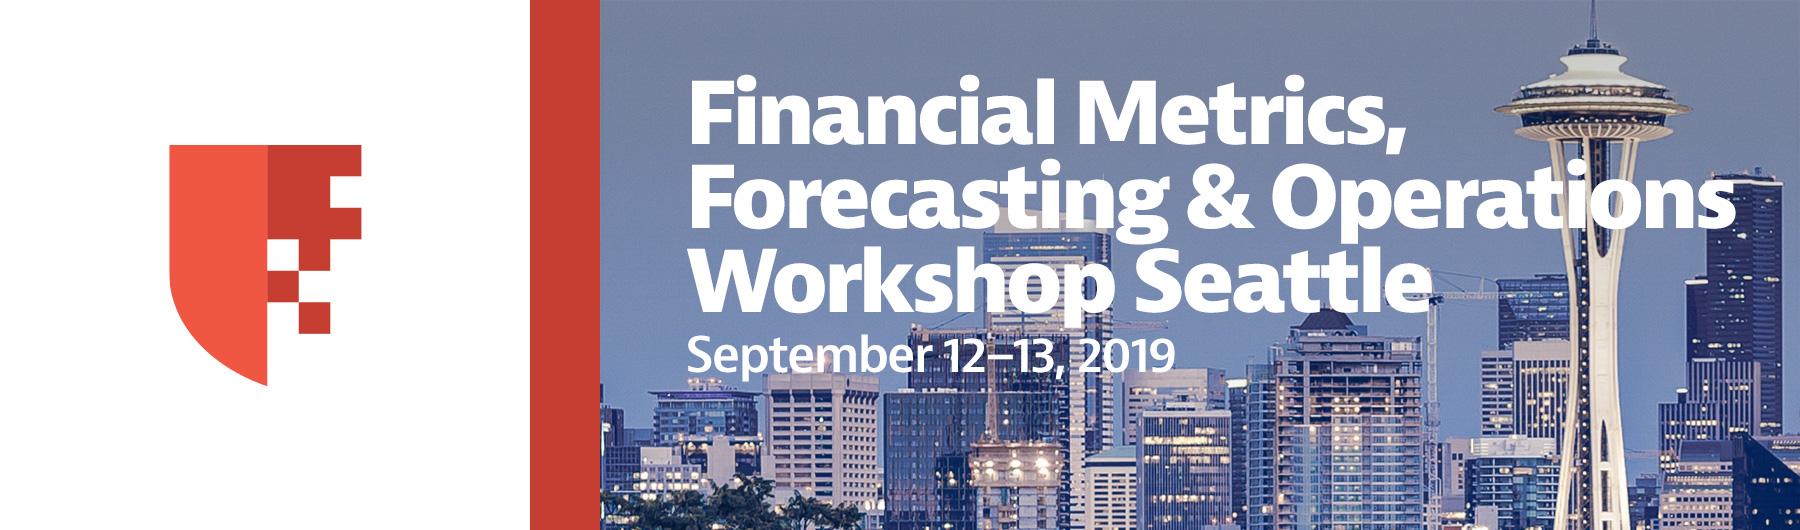 CANCELED: Financial Metrics, Forecasting & Operations Workshop Seattle